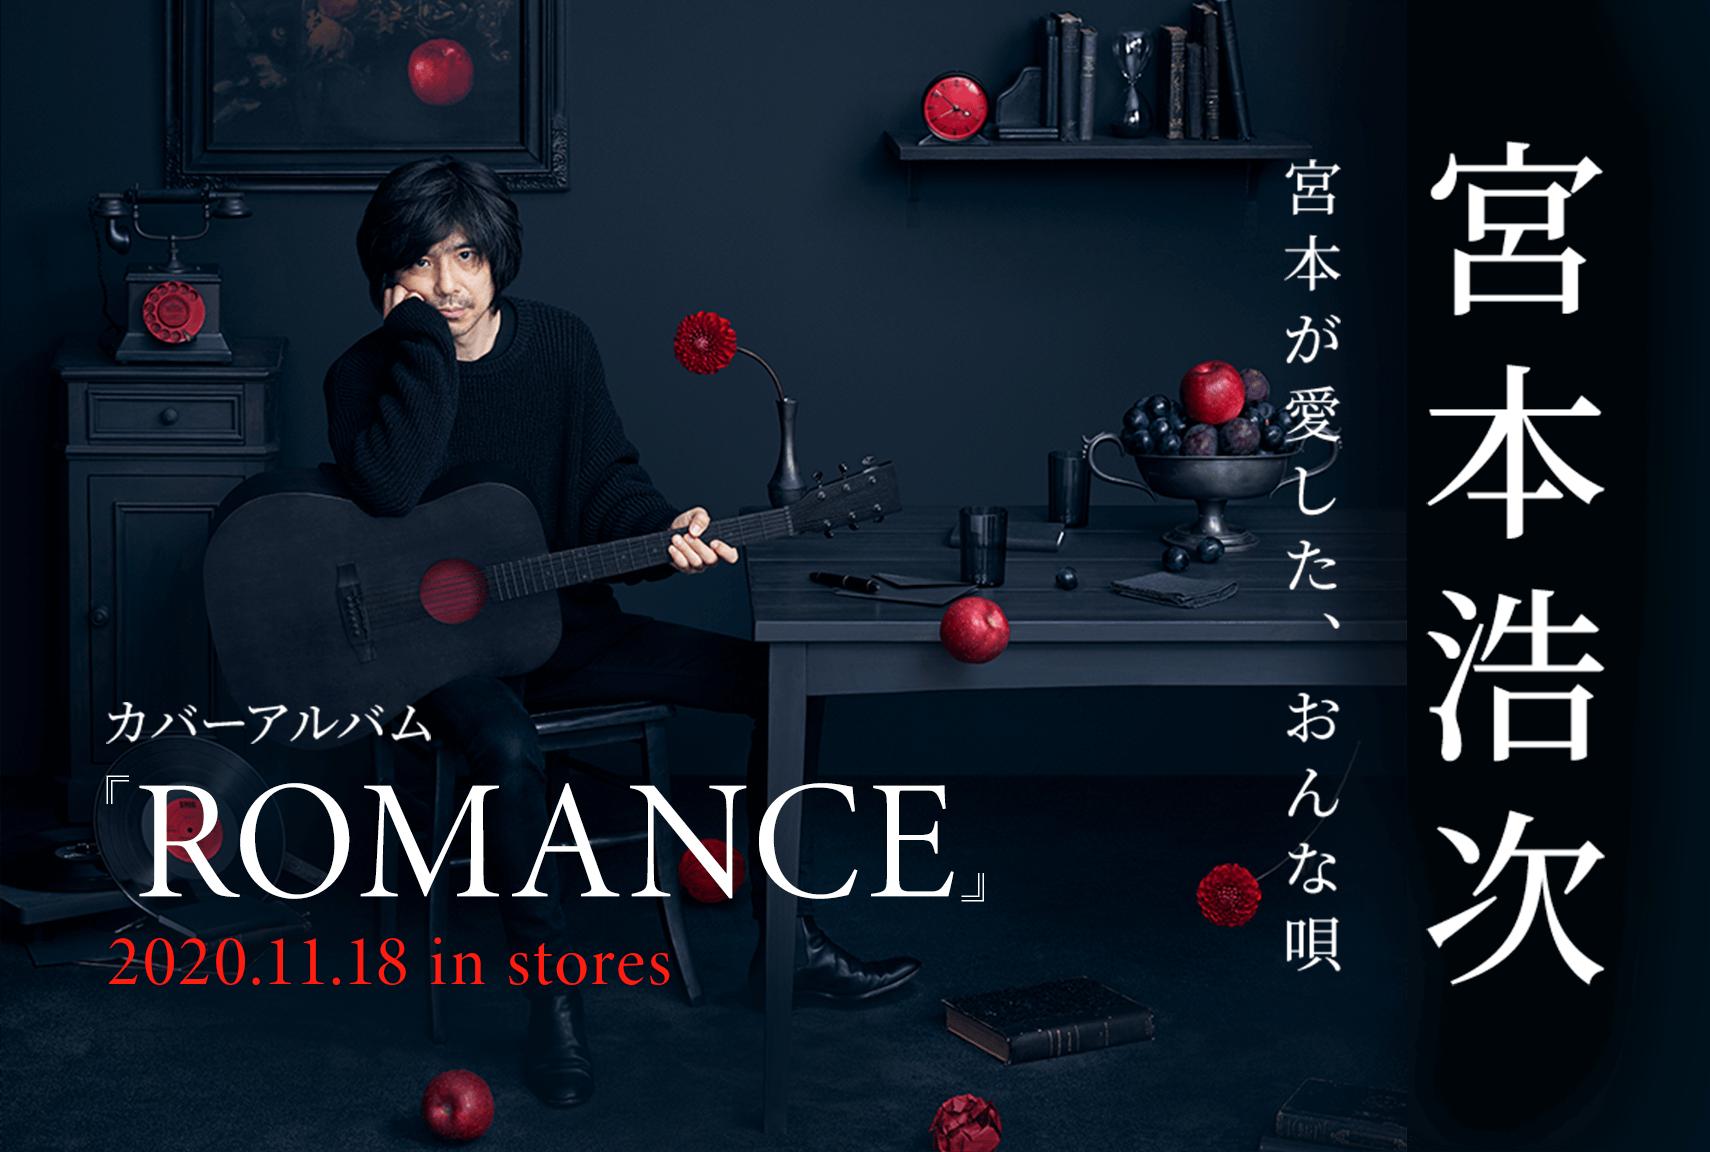 https://sp.universal-music.co.jp/miyamotohiroji/romance/common/images/mv_pc.png